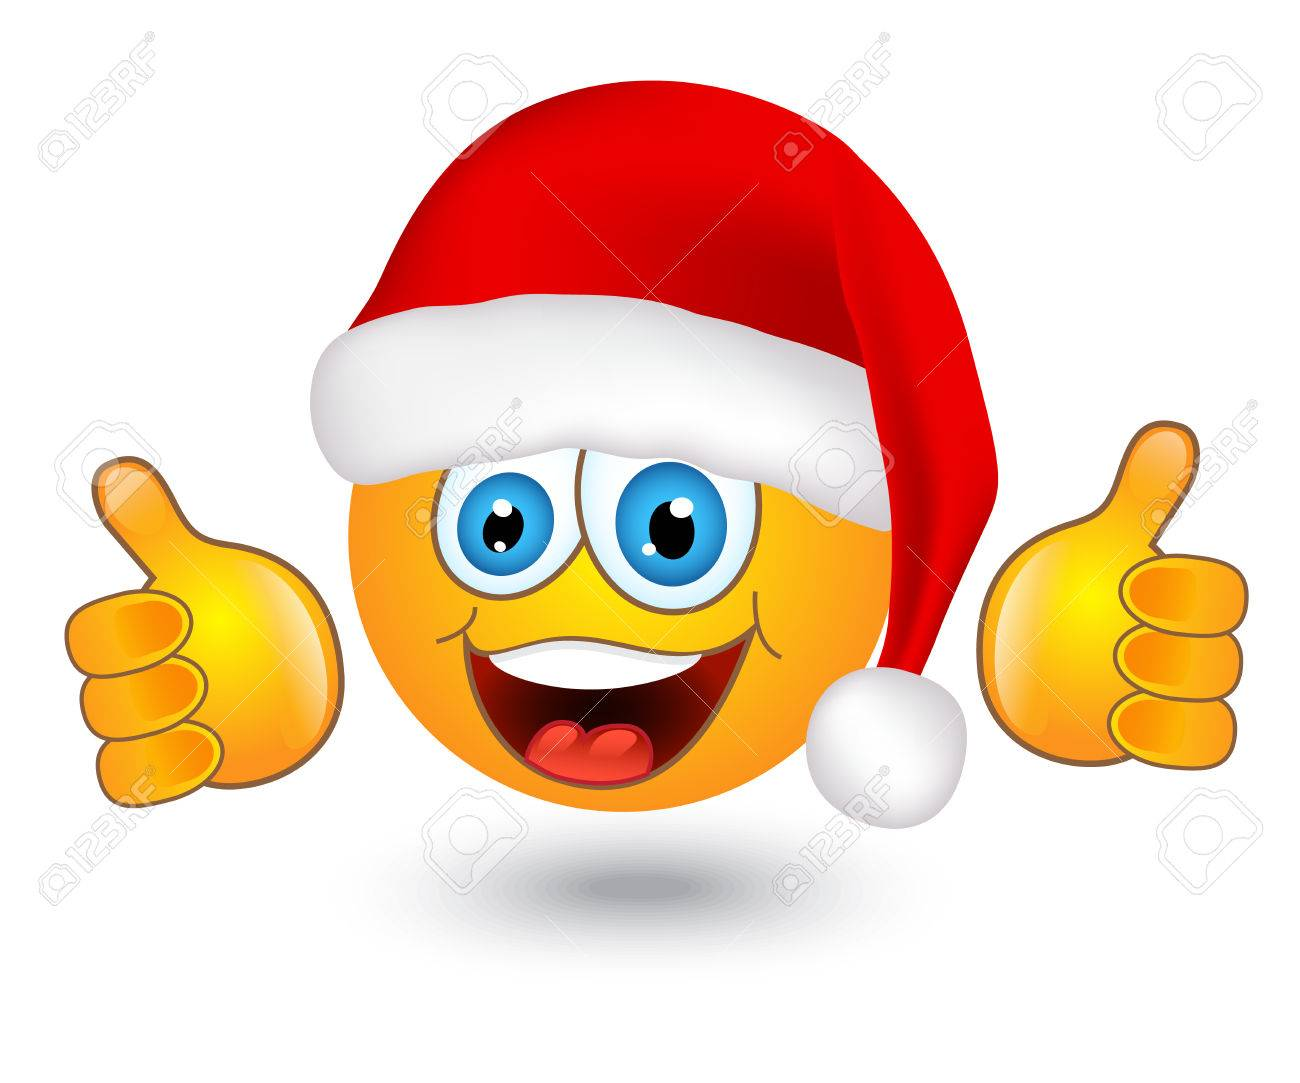 yellow shiny round emotion in Santa hat on white background - 24054326